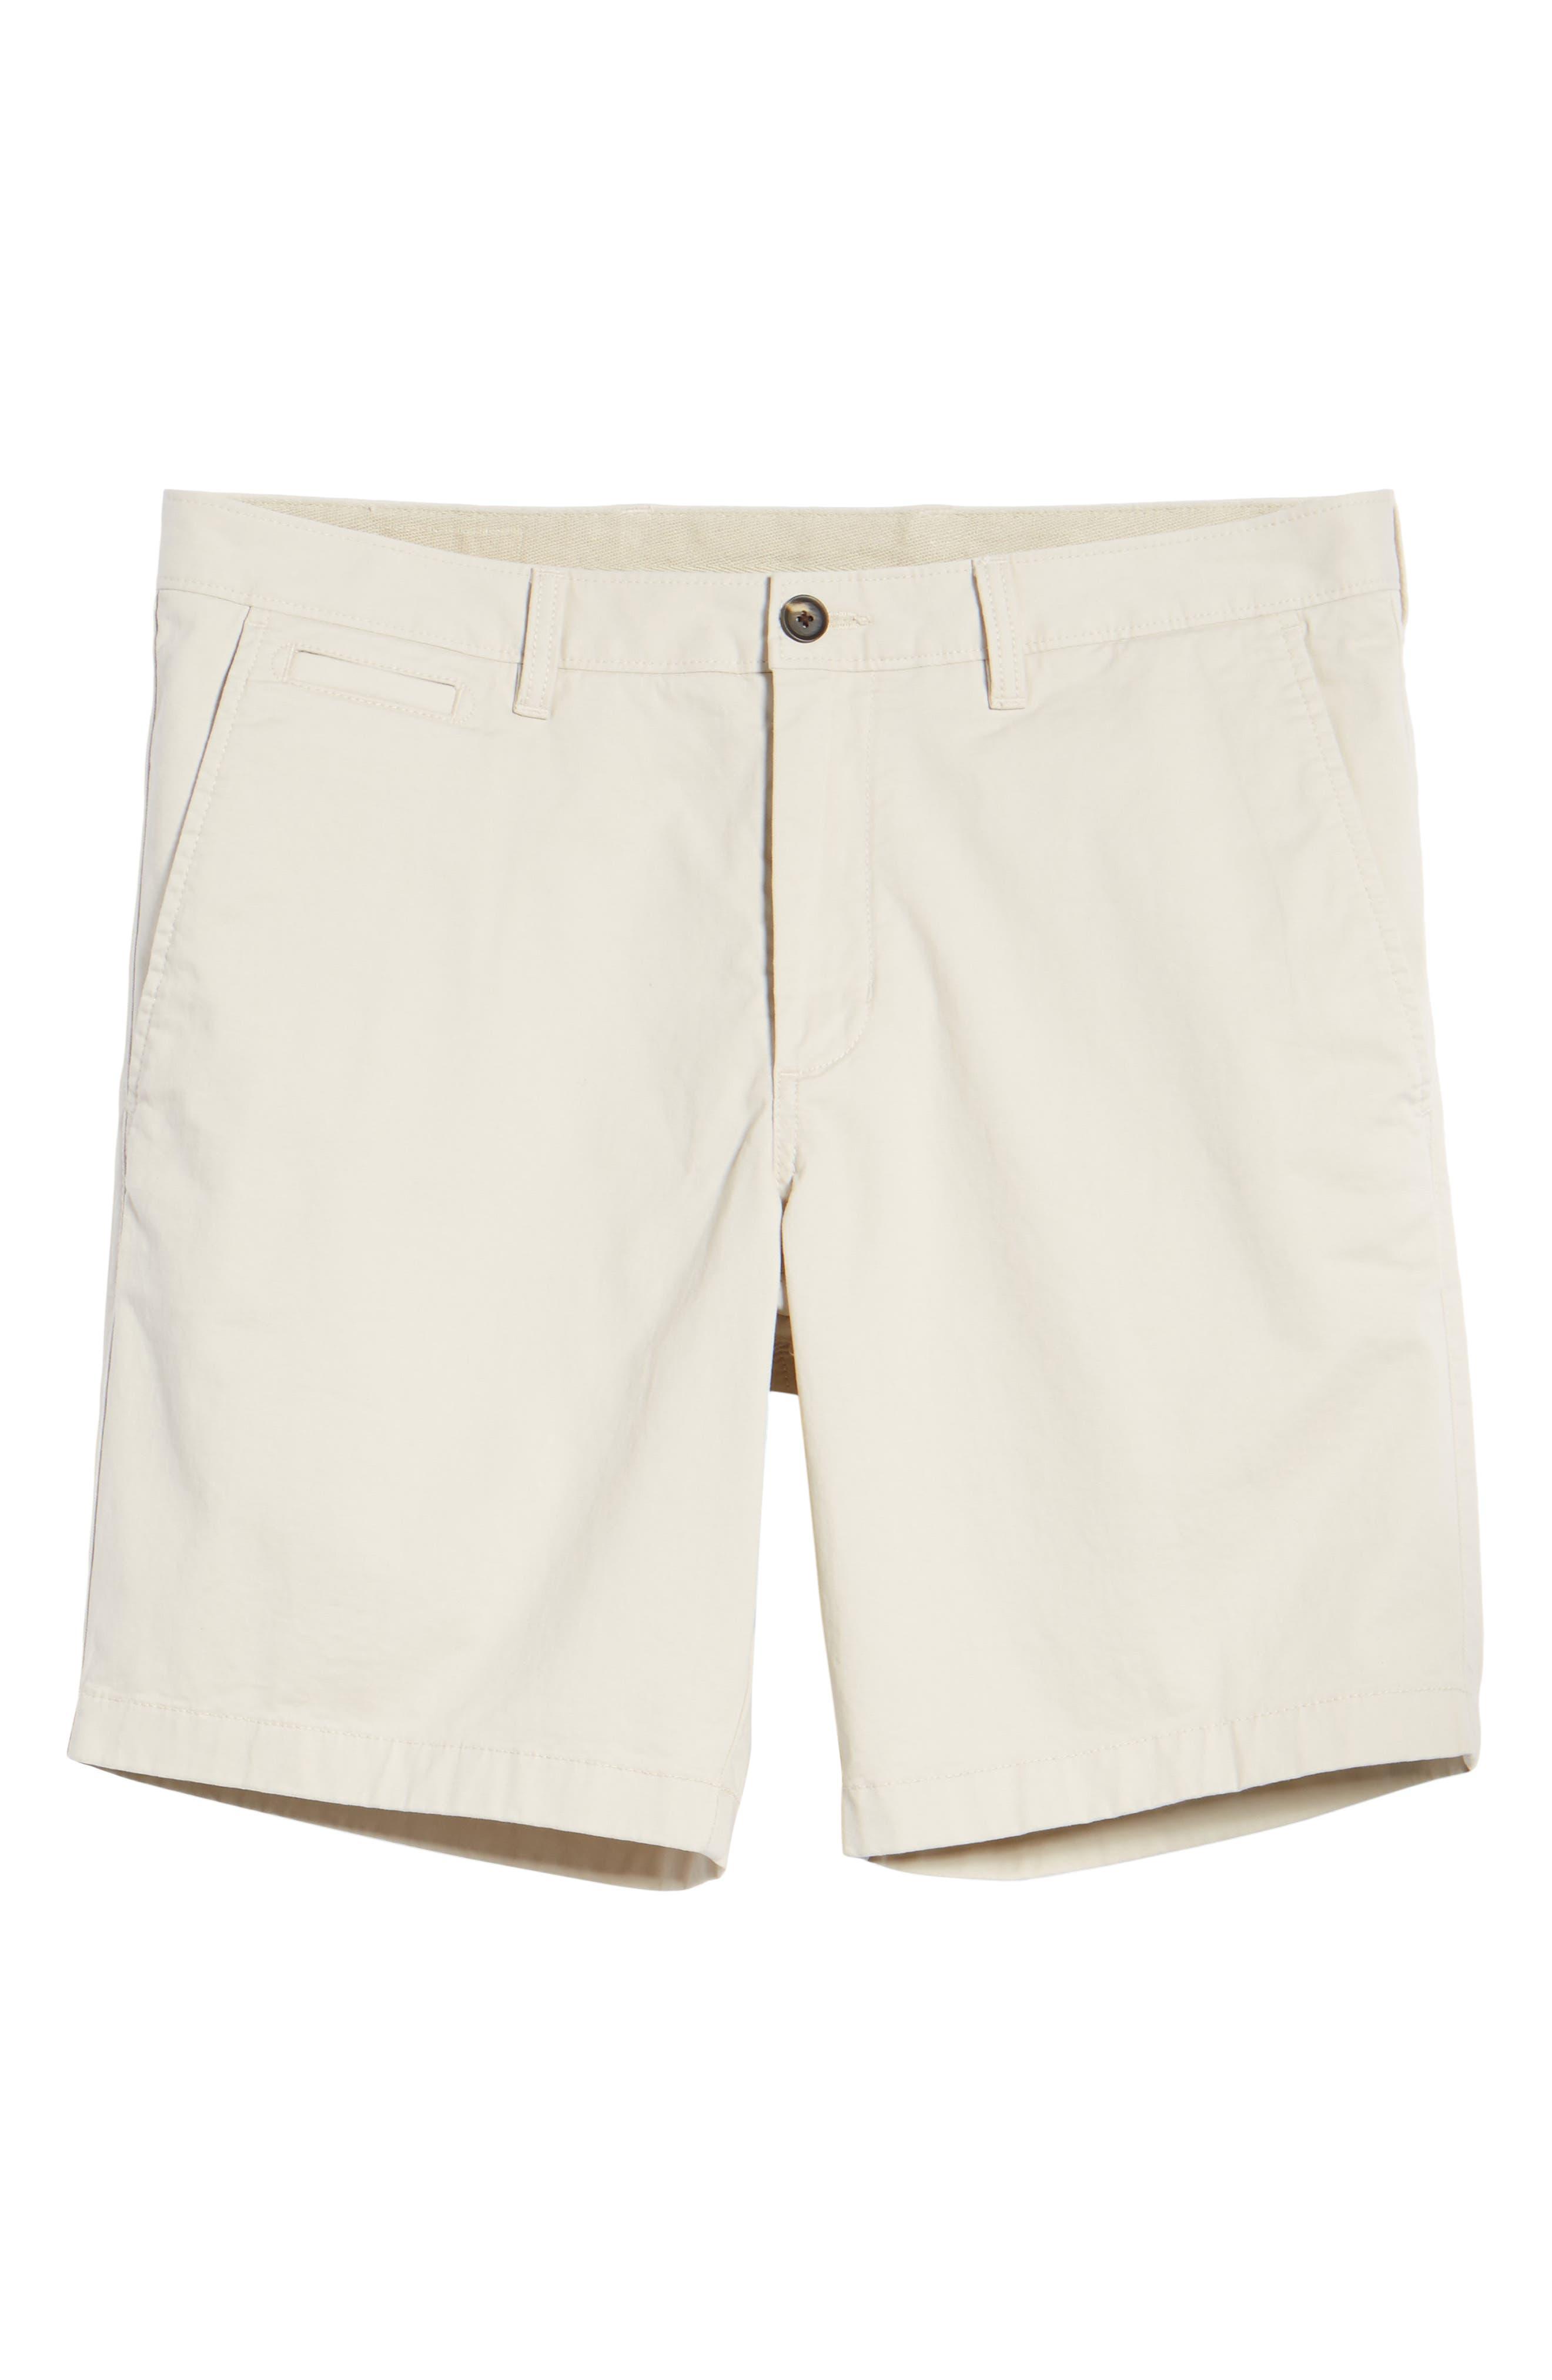 Ballard Slim Fit Stretch Chino 9-Inch Shorts,                             Alternate thumbnail 64, color,